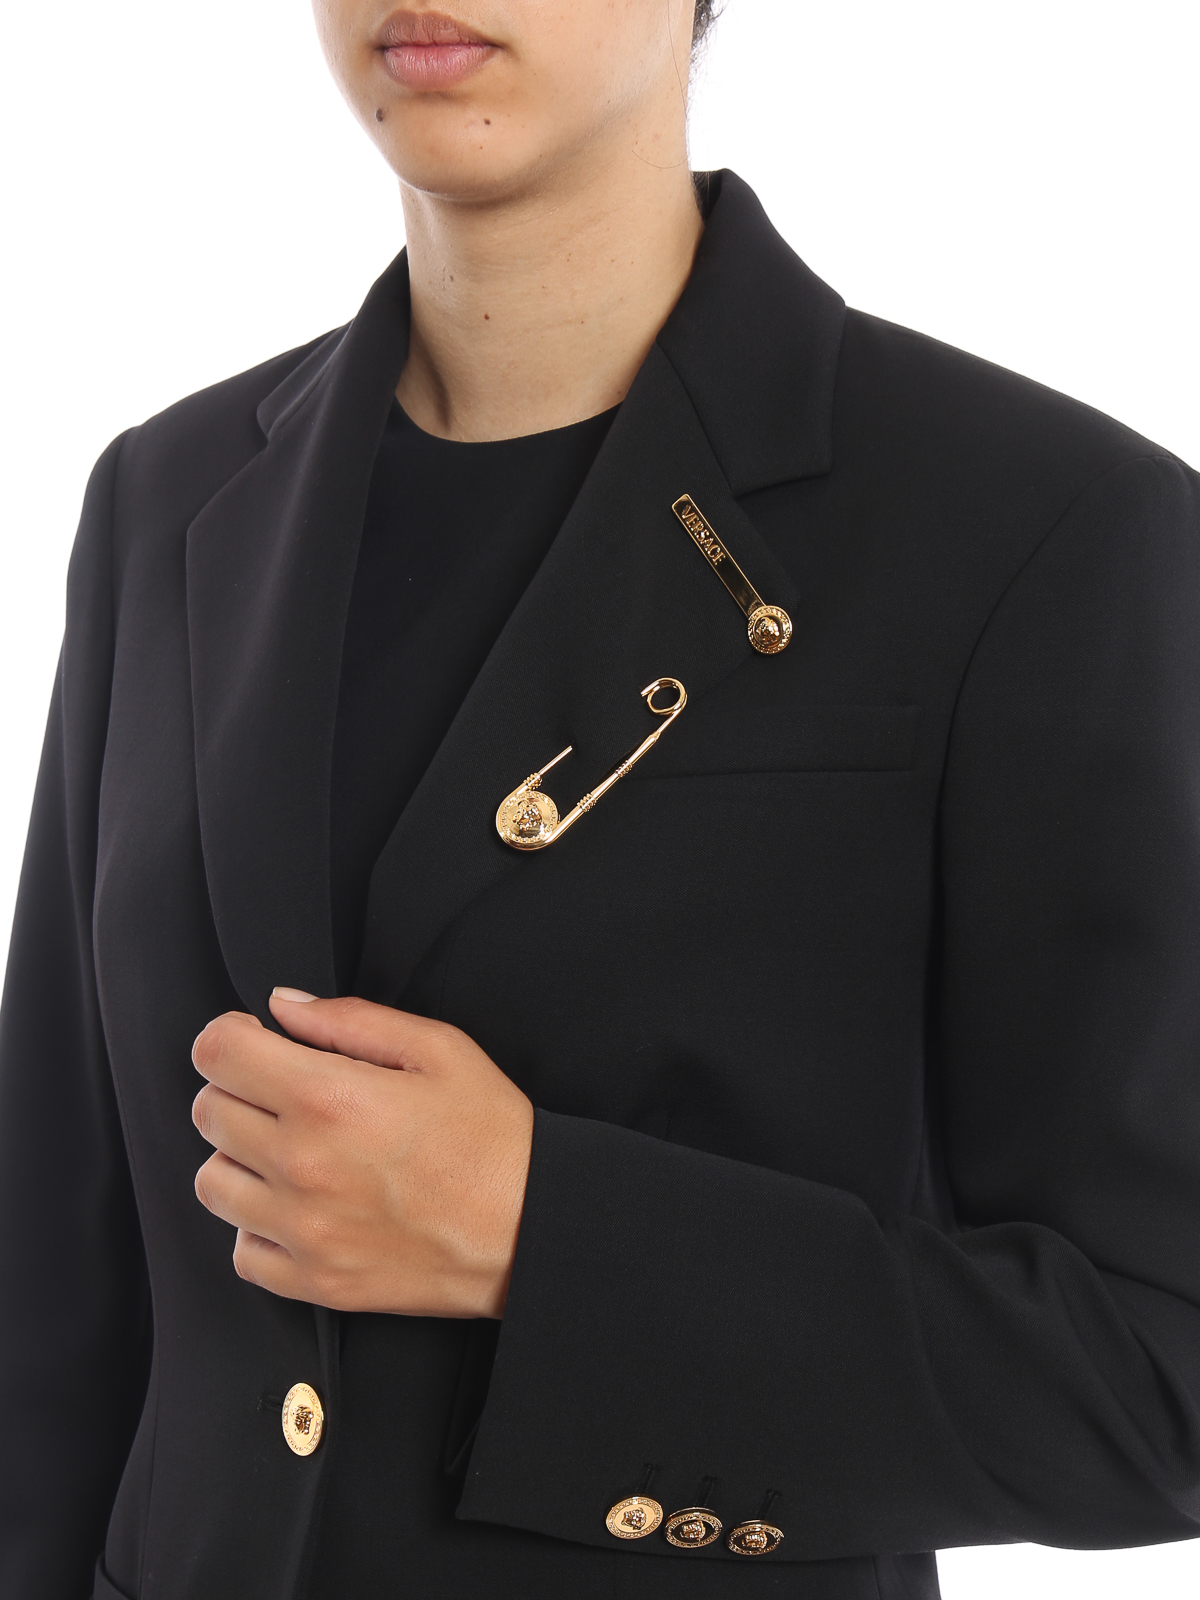 b9d85462e5 Versace - Medusa button and safety pin long blazer - Tailored ...